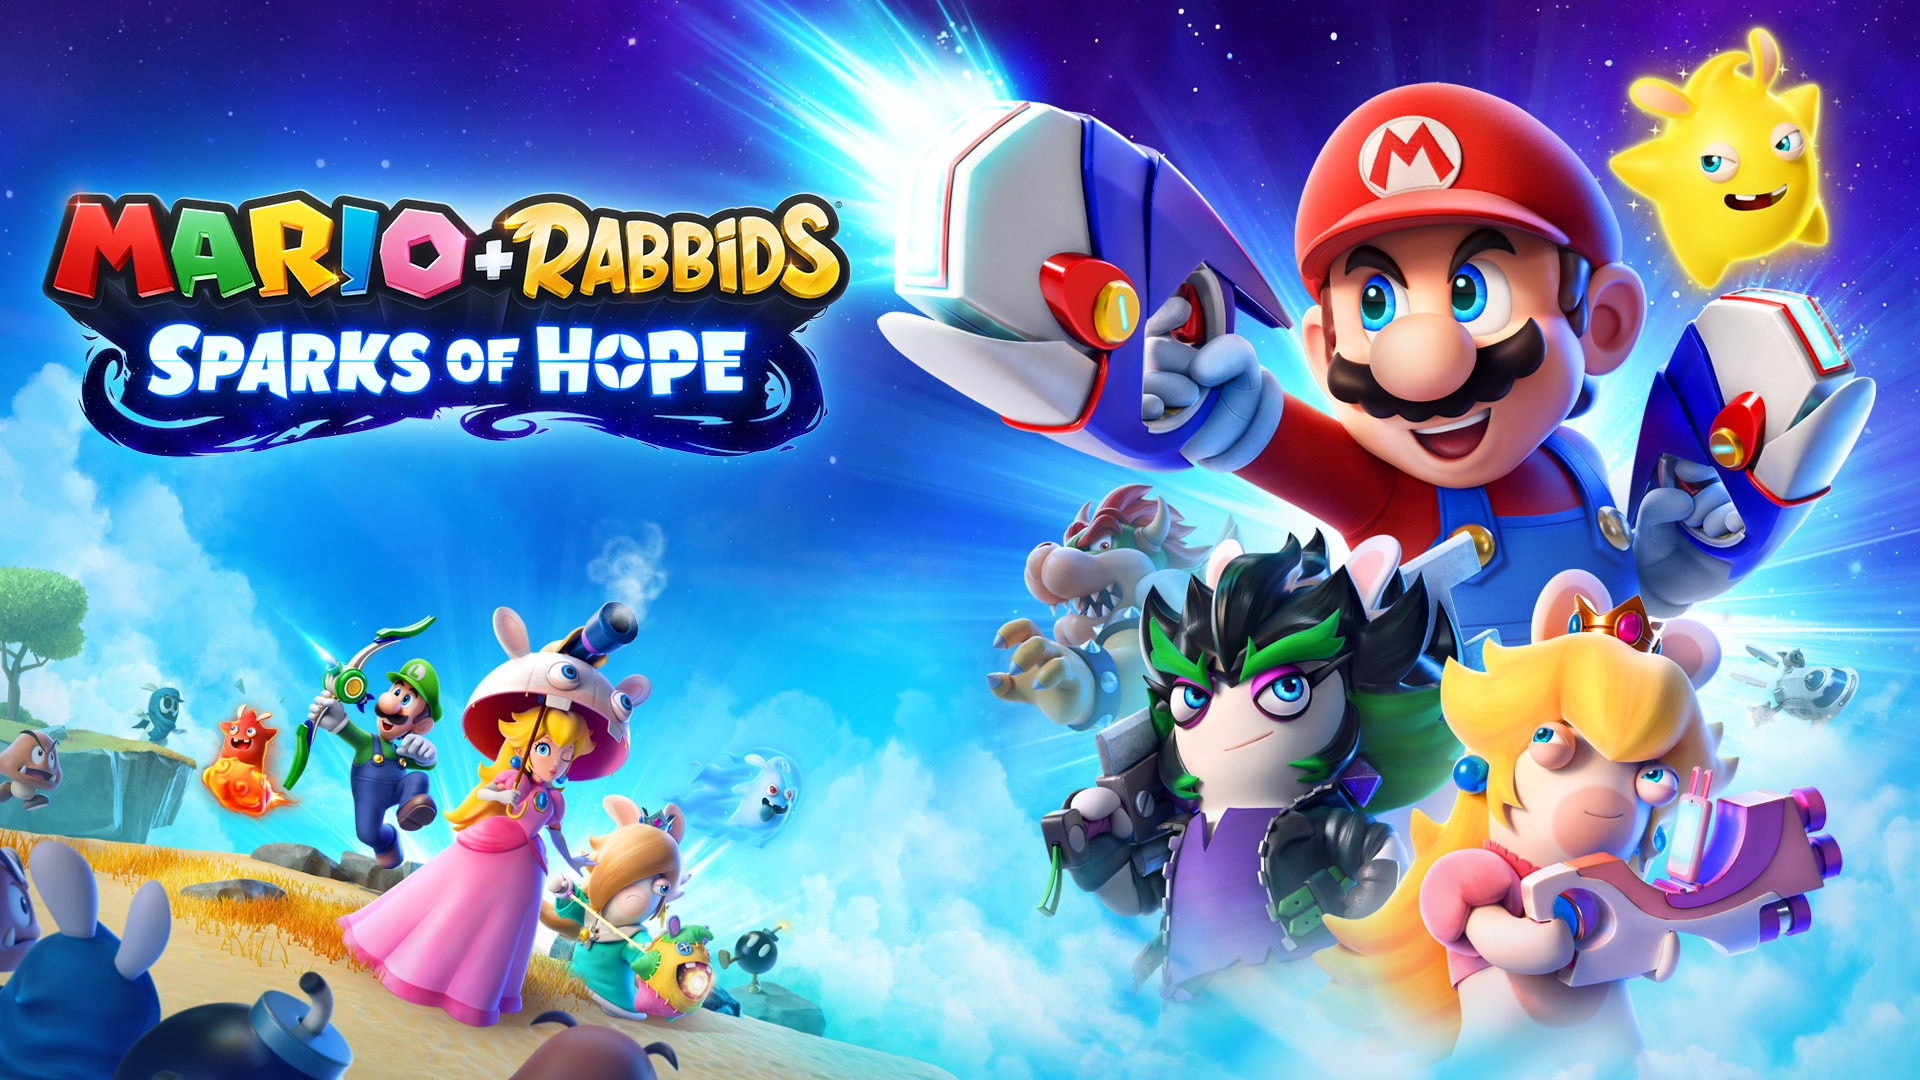 Mario + Rabbids, sparks of hope, E3, ubisoft, leak, nintendo, Kingdom battle, Mario + Rabbids Sparks of Hope